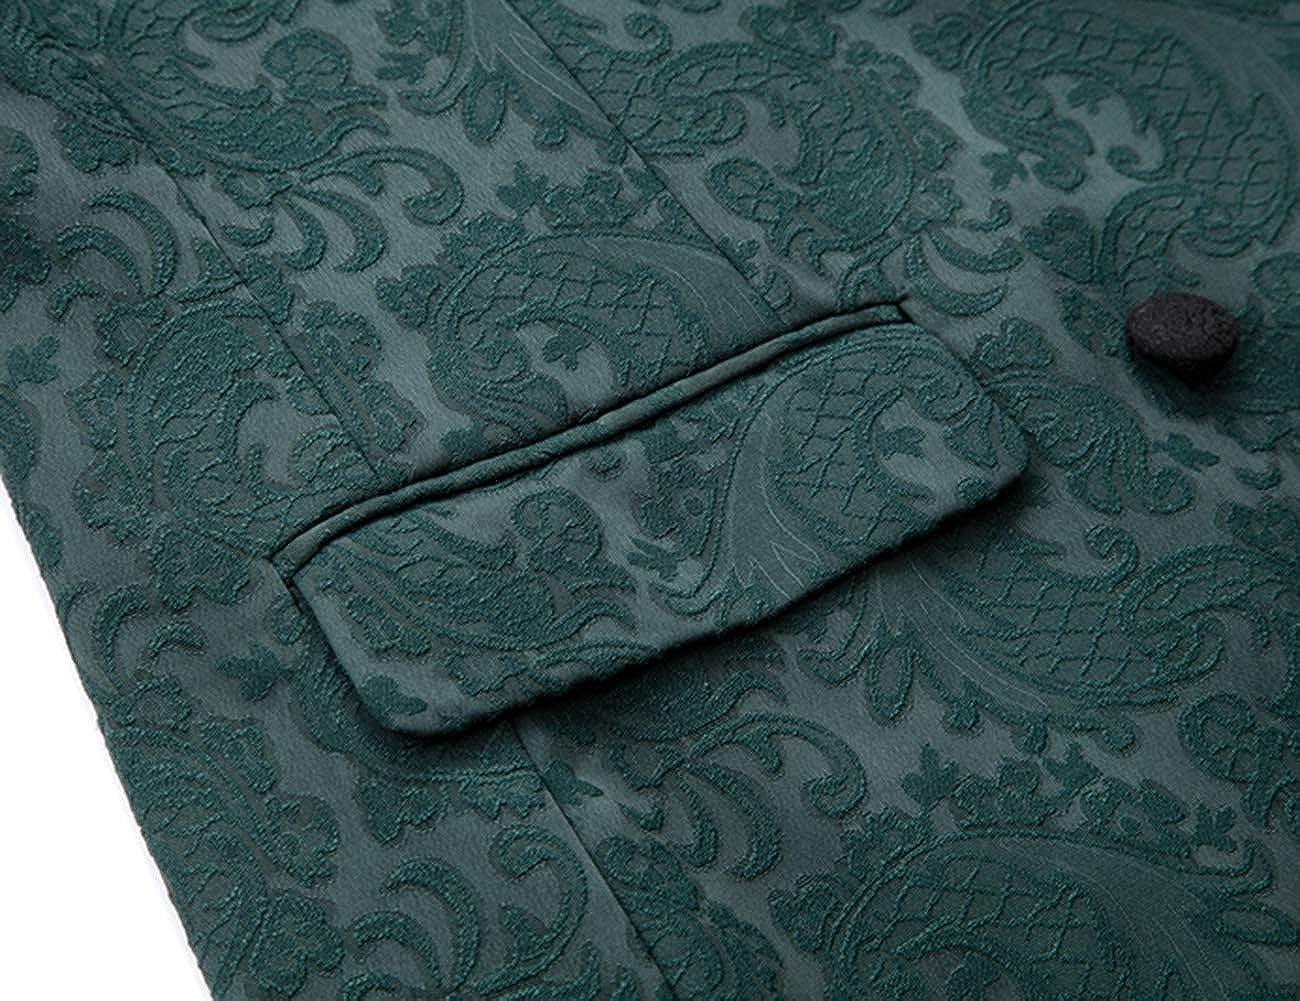 Wemaliyzd Mens 3 Pieces Jacquard Wedding Suit Classic Fit Blazer Vest Pants